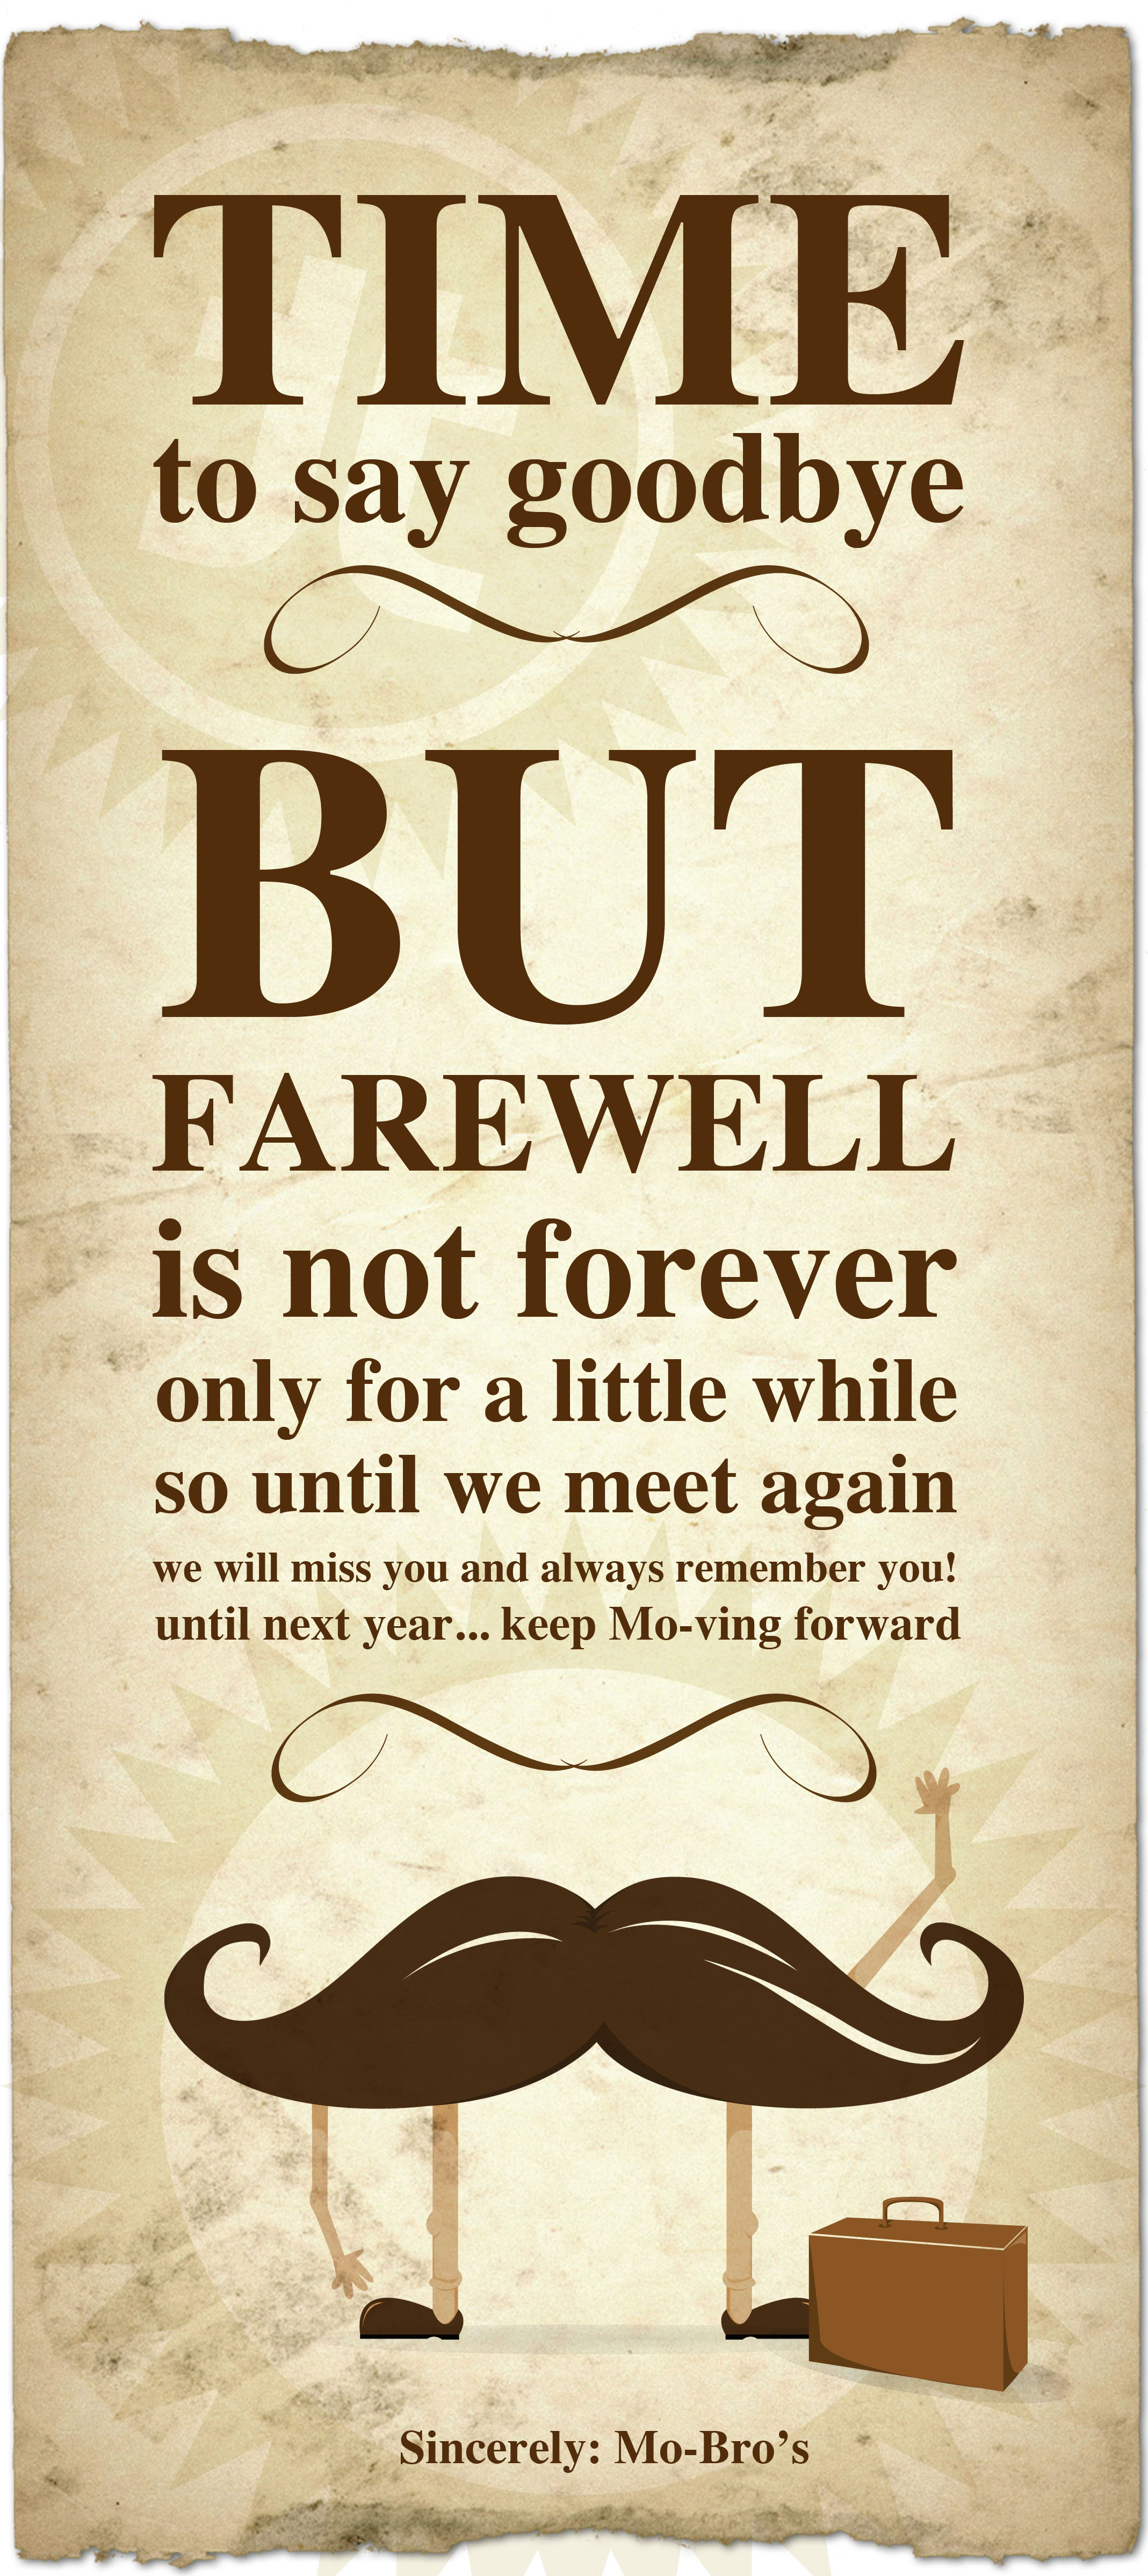 Farewell Card Quotes. QuotesGram